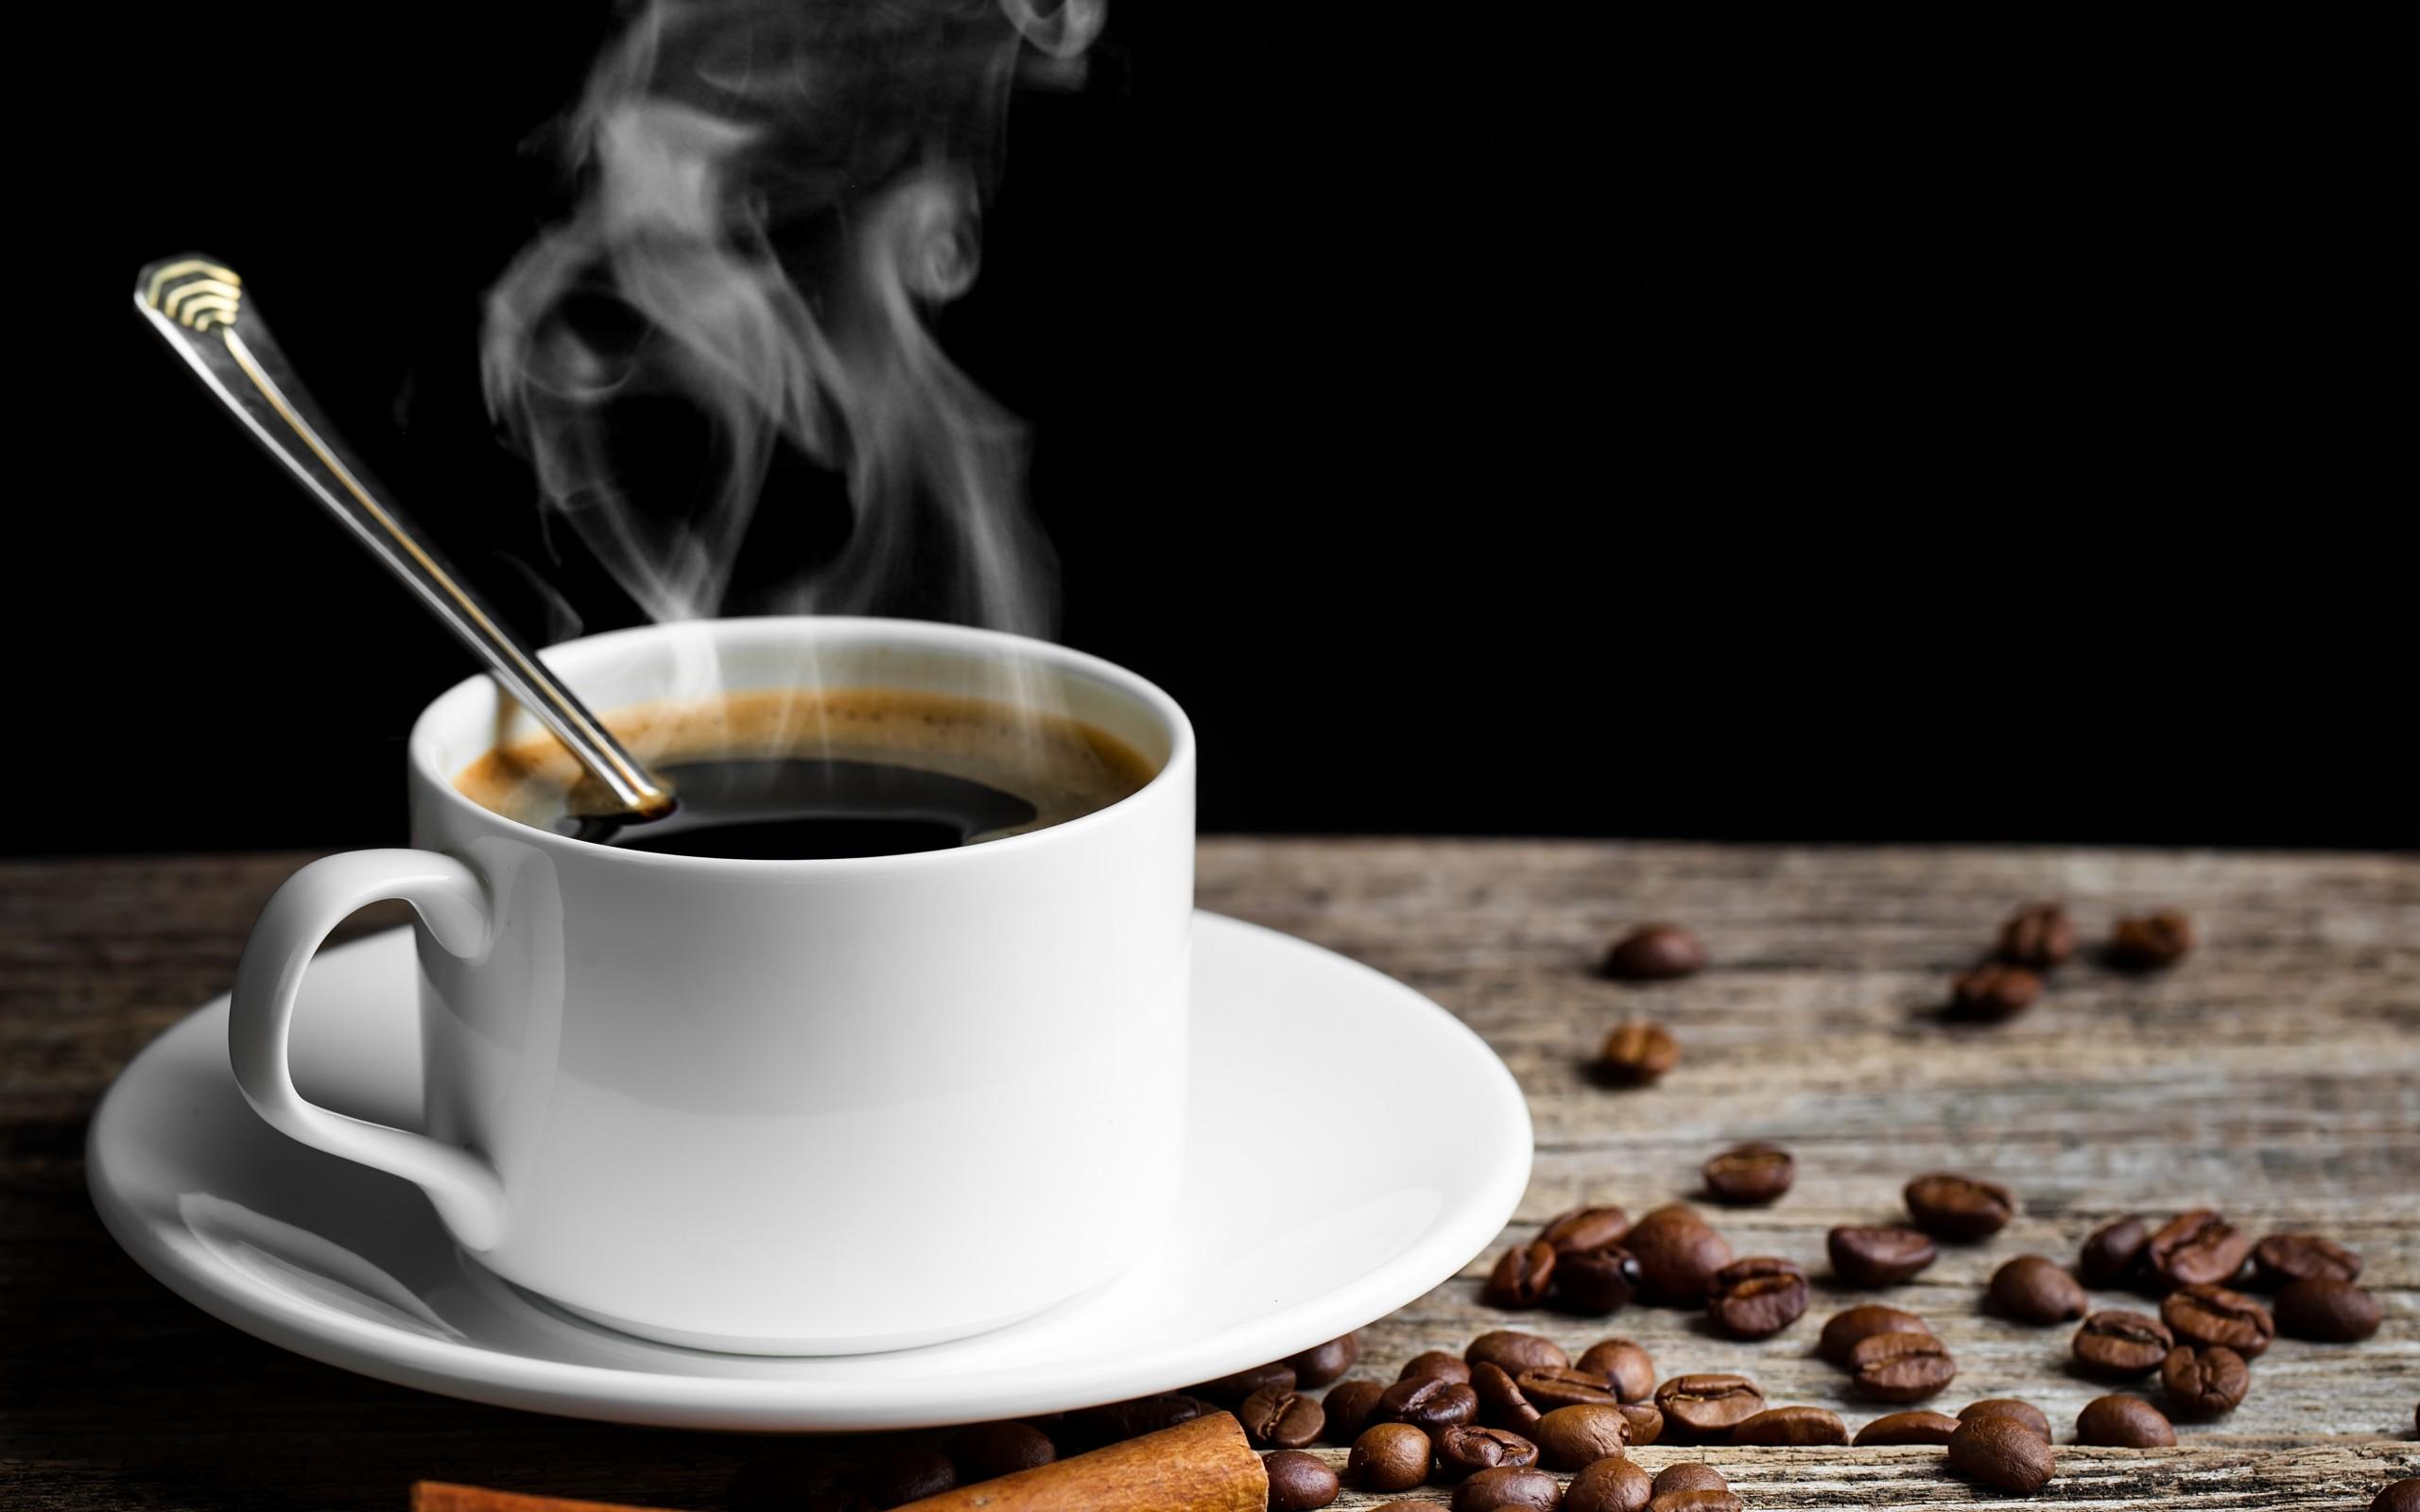 hot coffee white background - photo #19